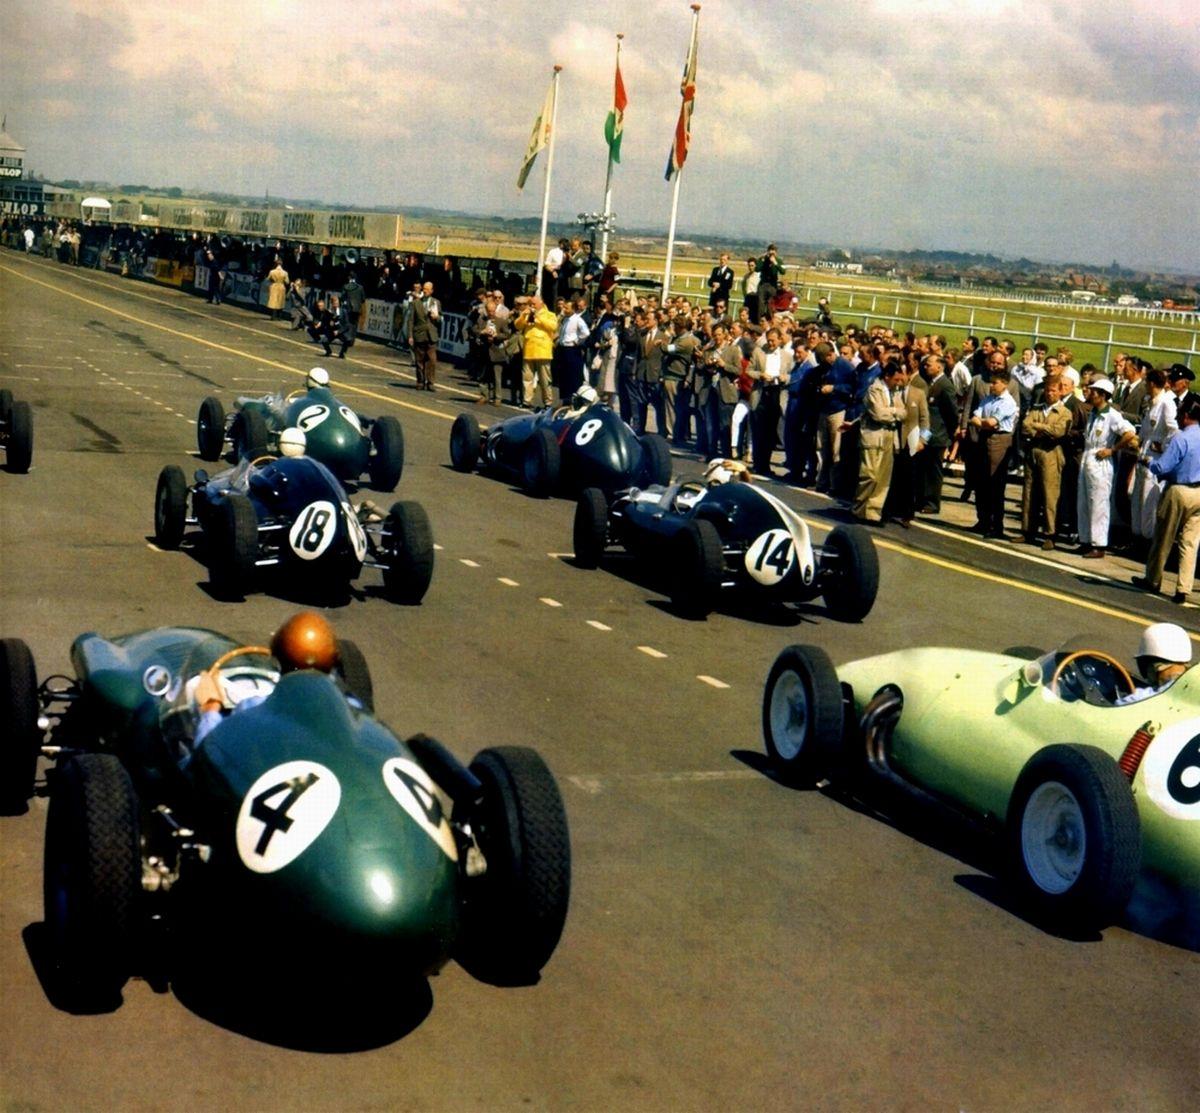 1959 British Grand Prix